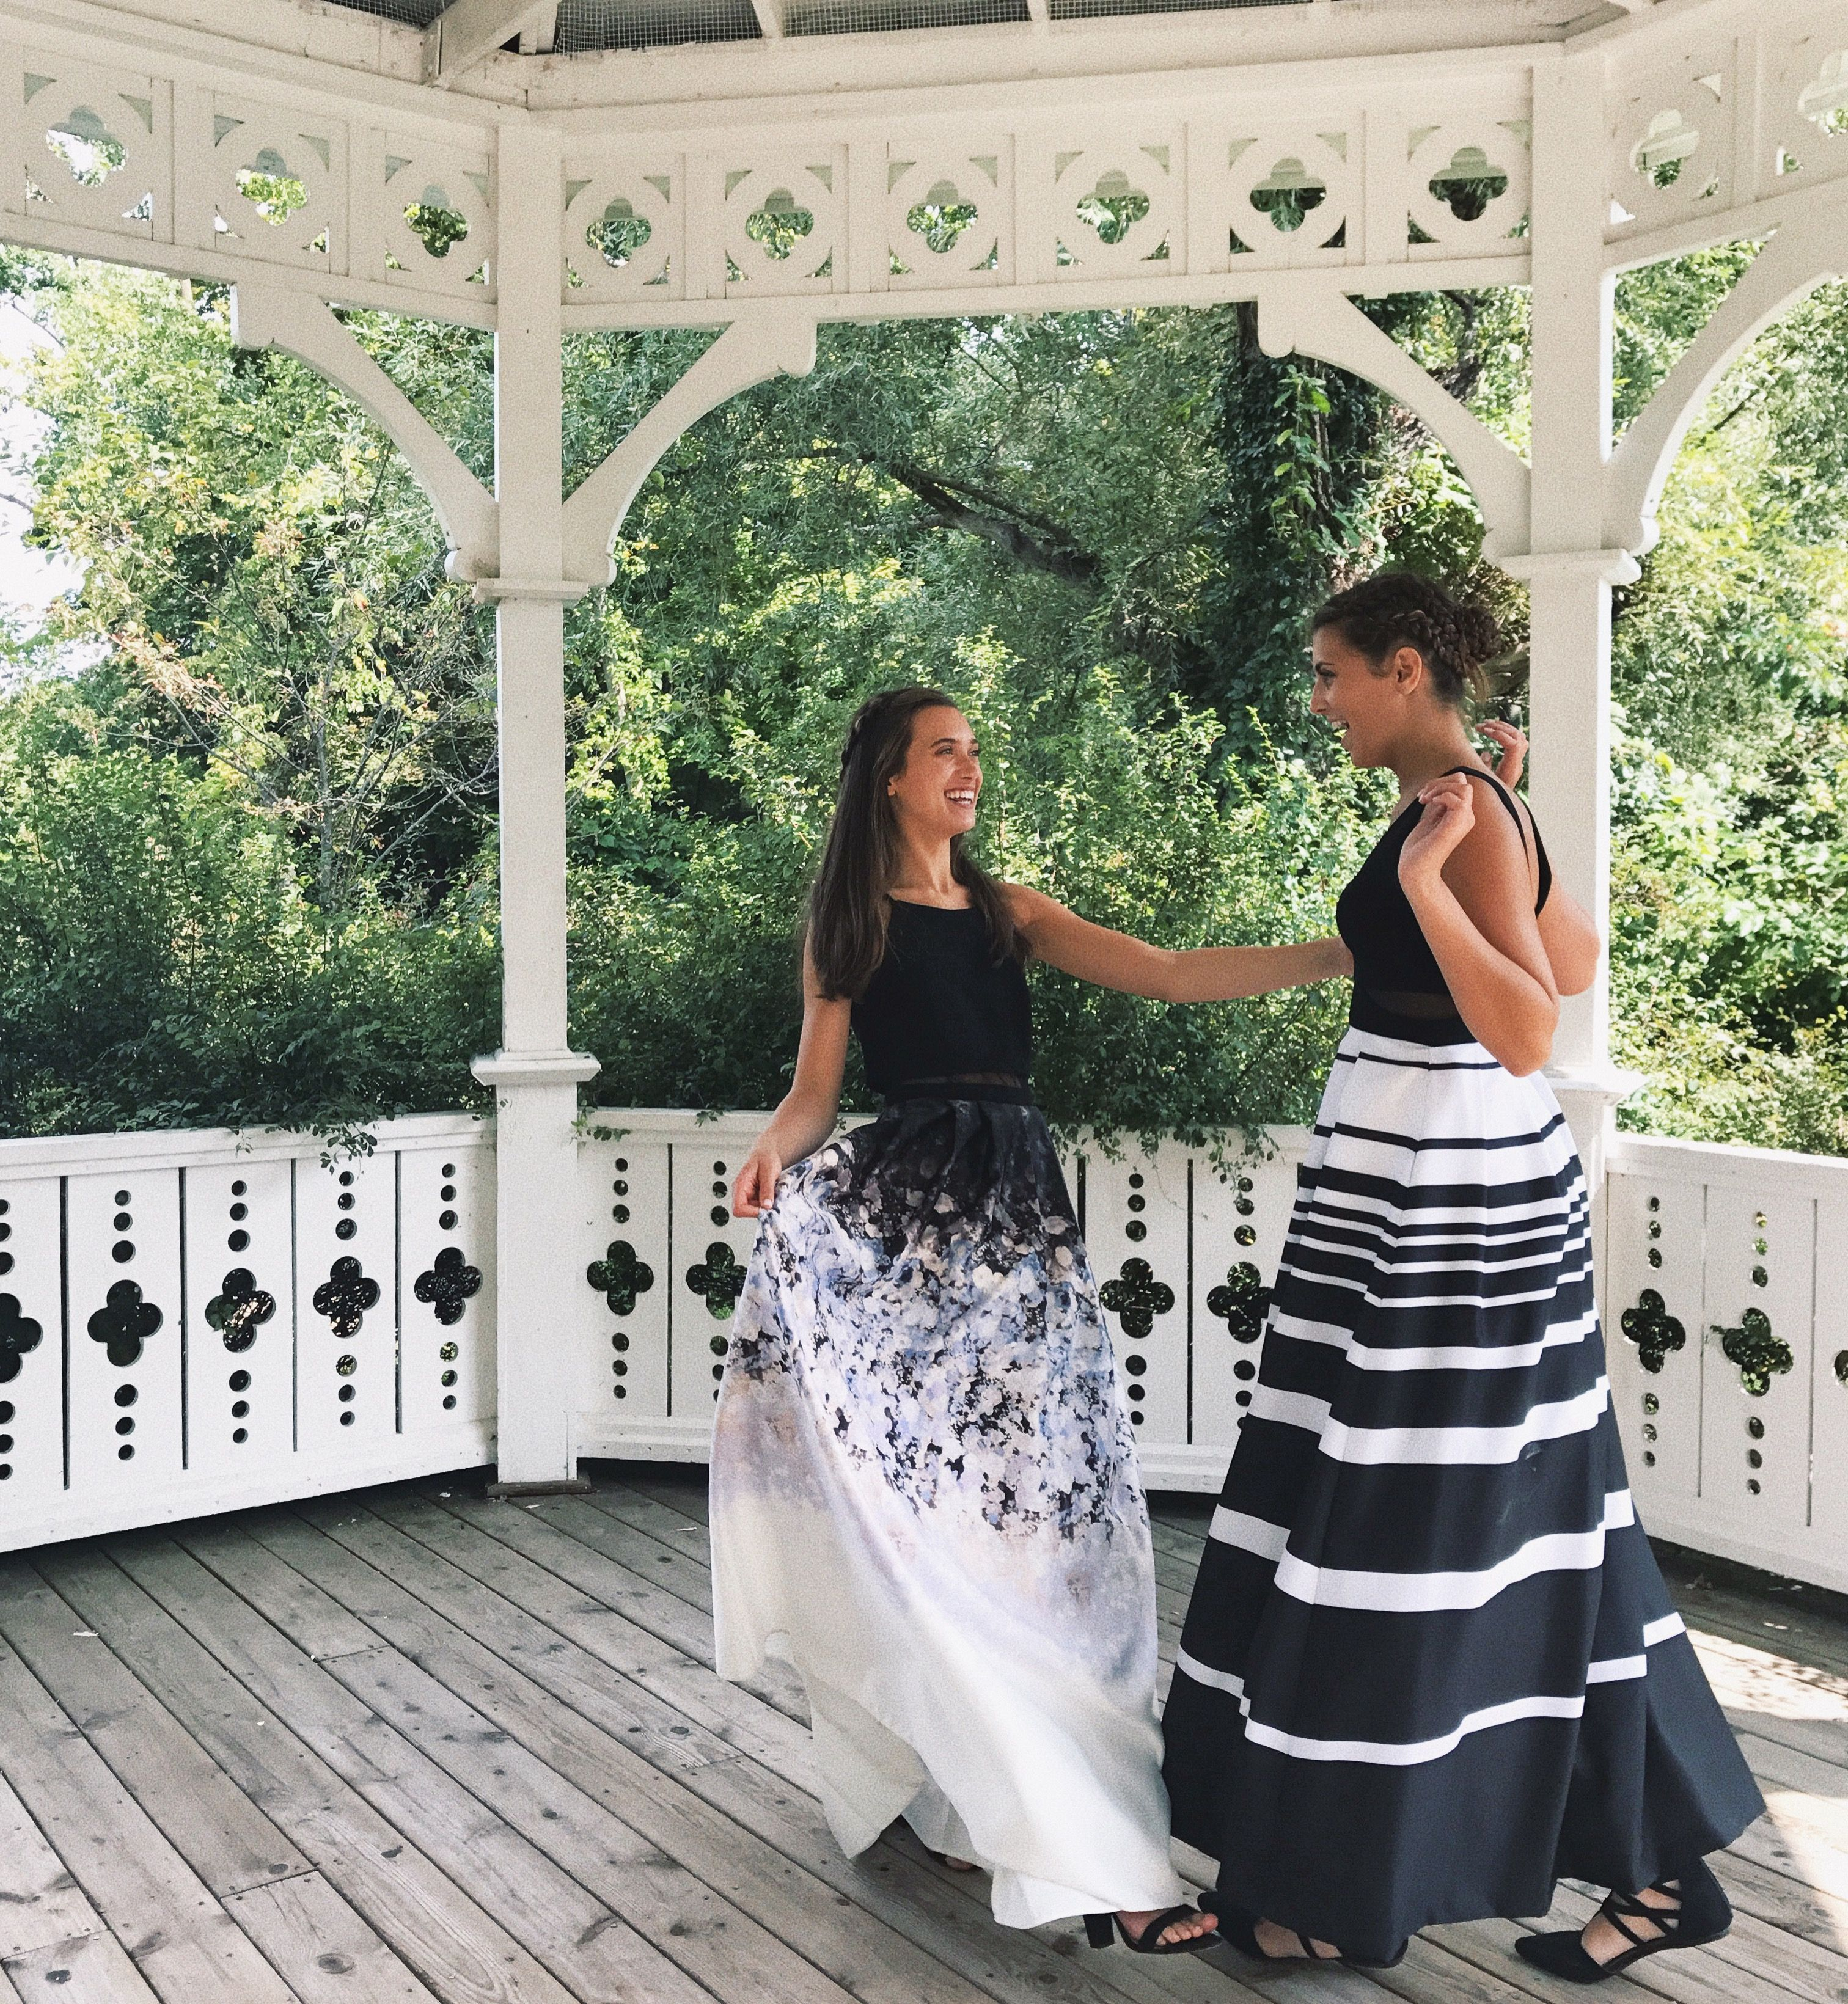 Best Friend Prom Dresses 2017 Dacc